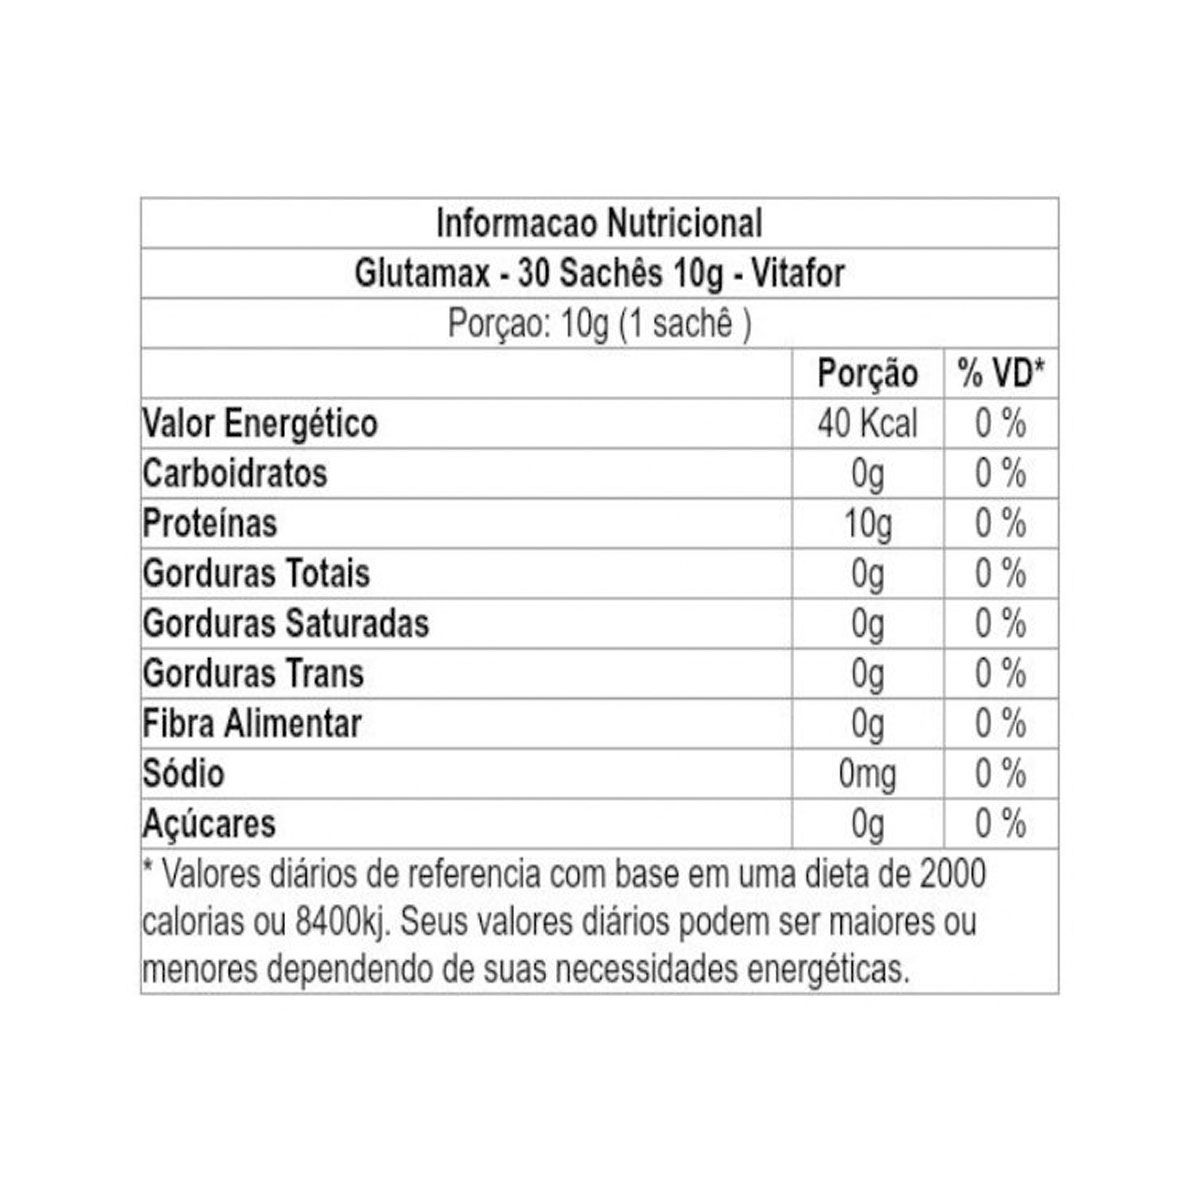 Glutamax 30 Sachês 10g - Vitafor